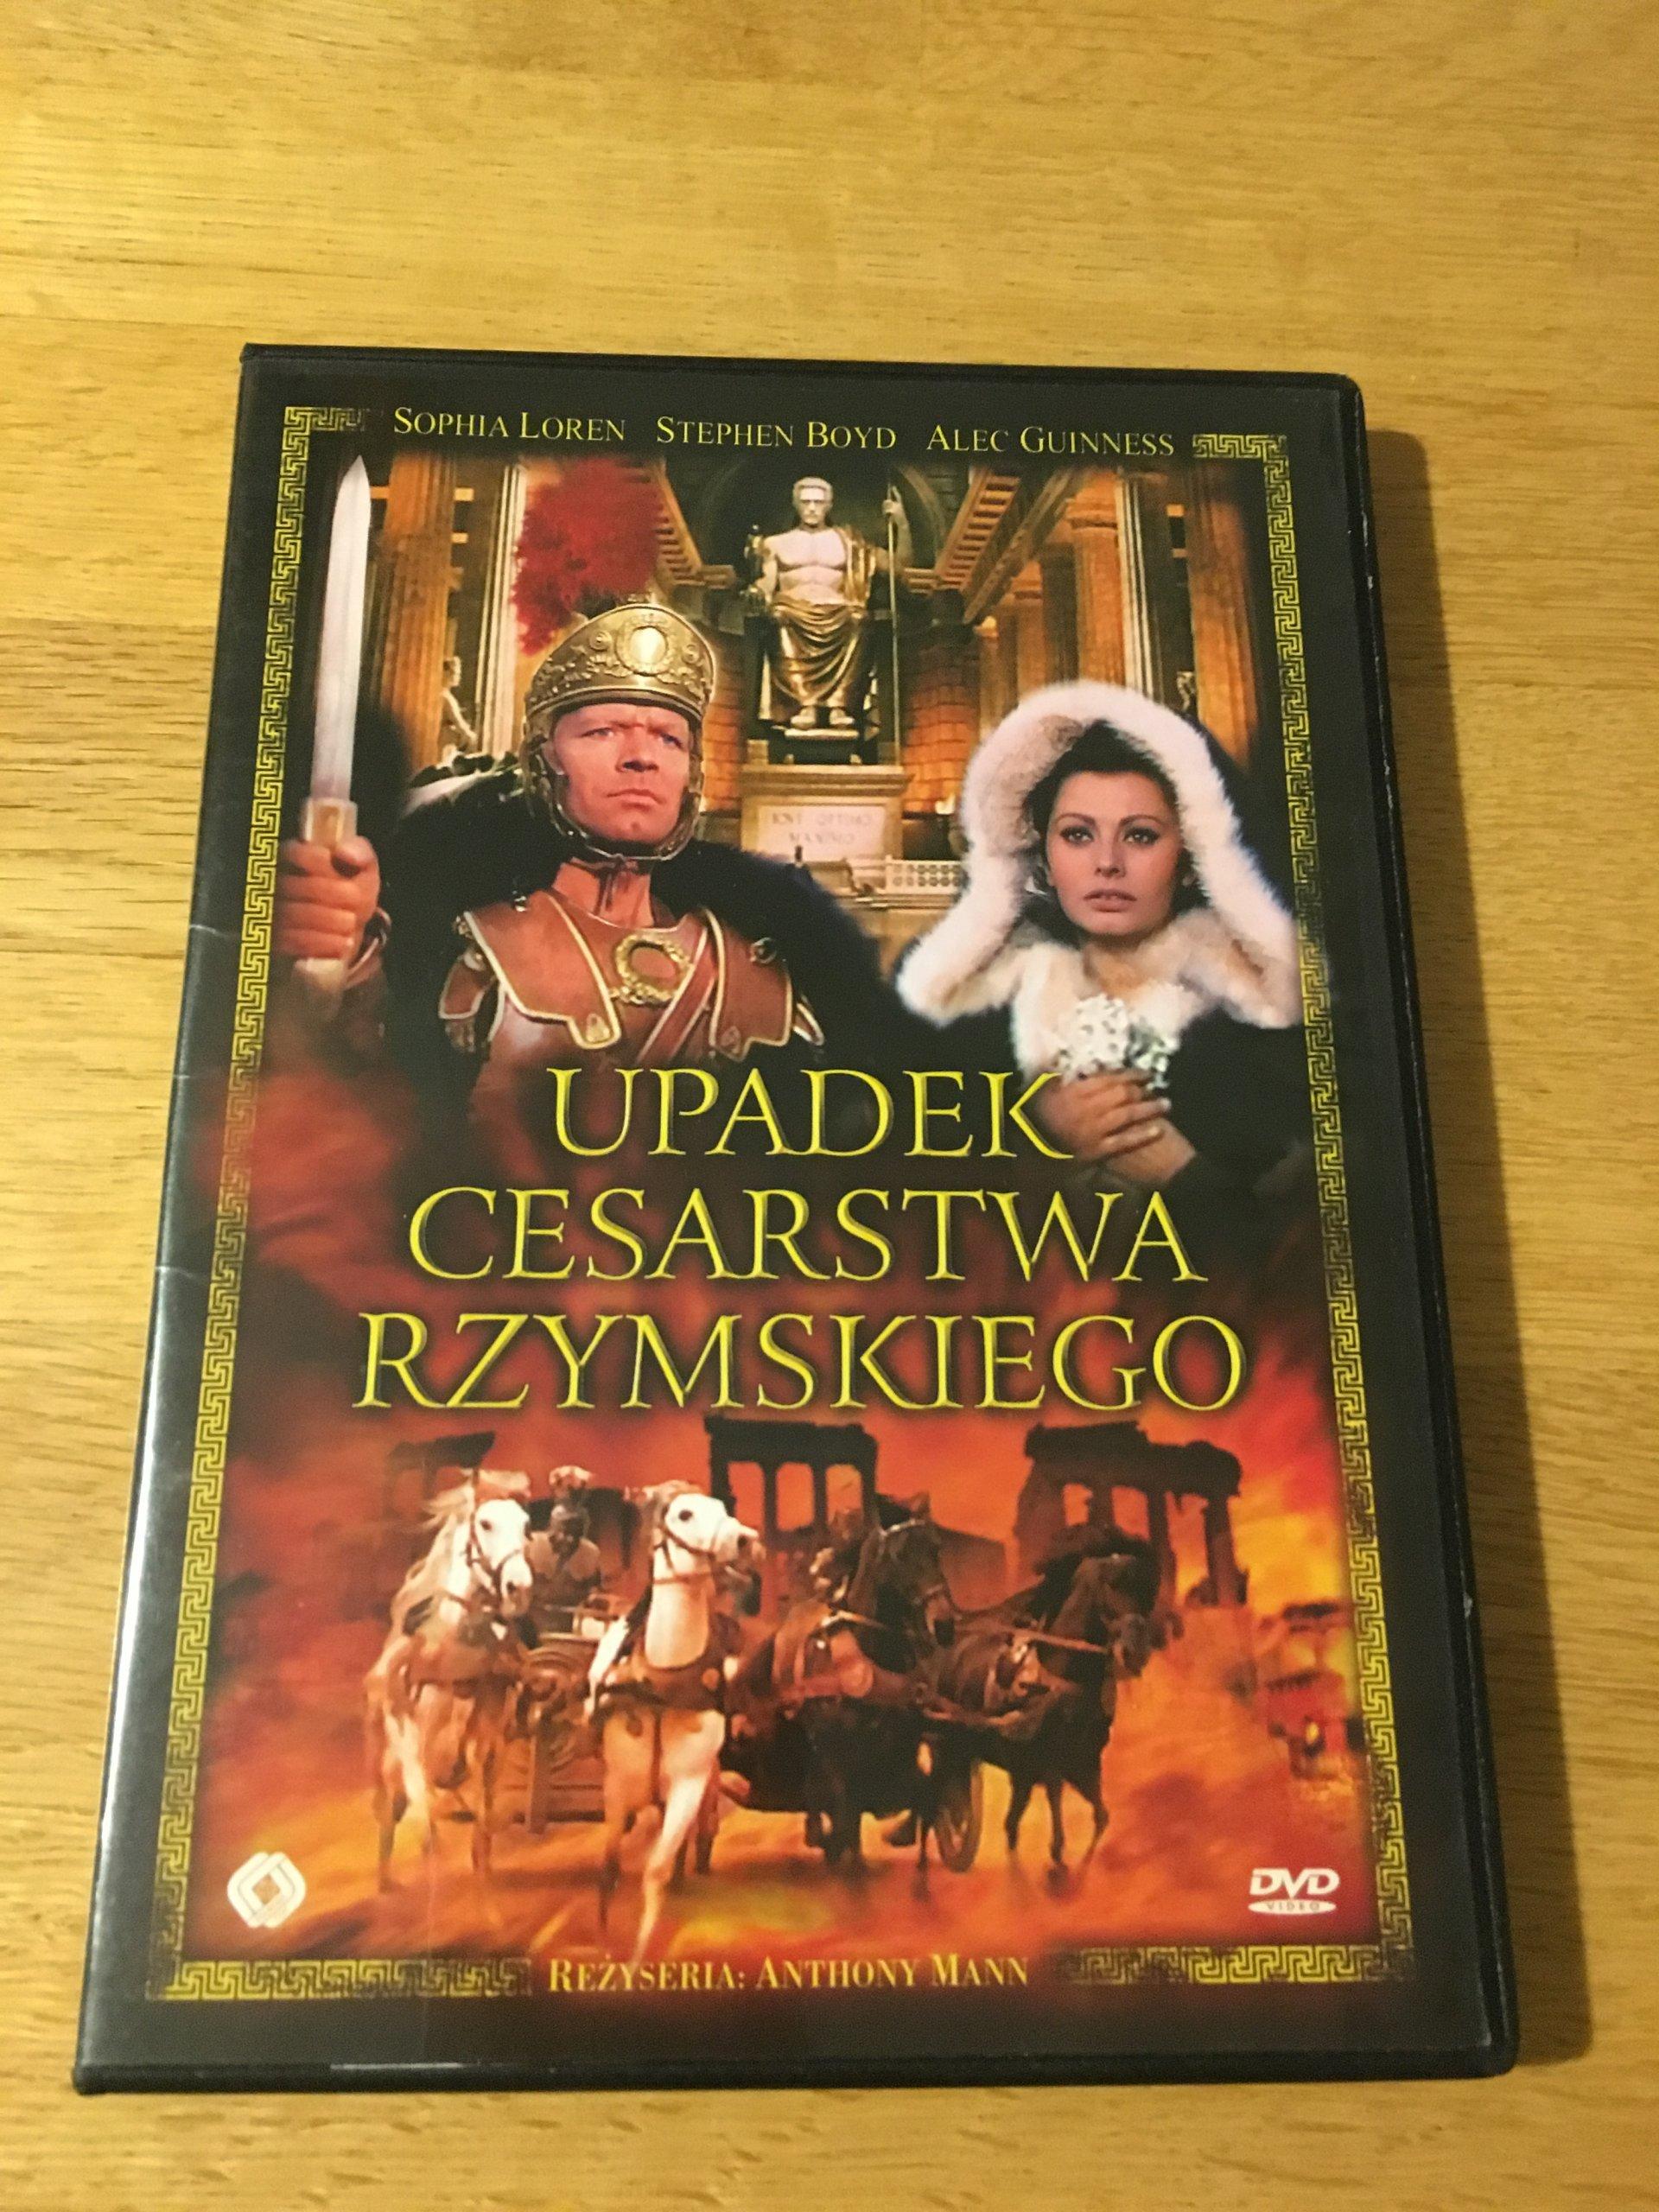 UPADEK CESARSTWA RZYMSKIEGO SOPHIA LOREN DVD NOWY